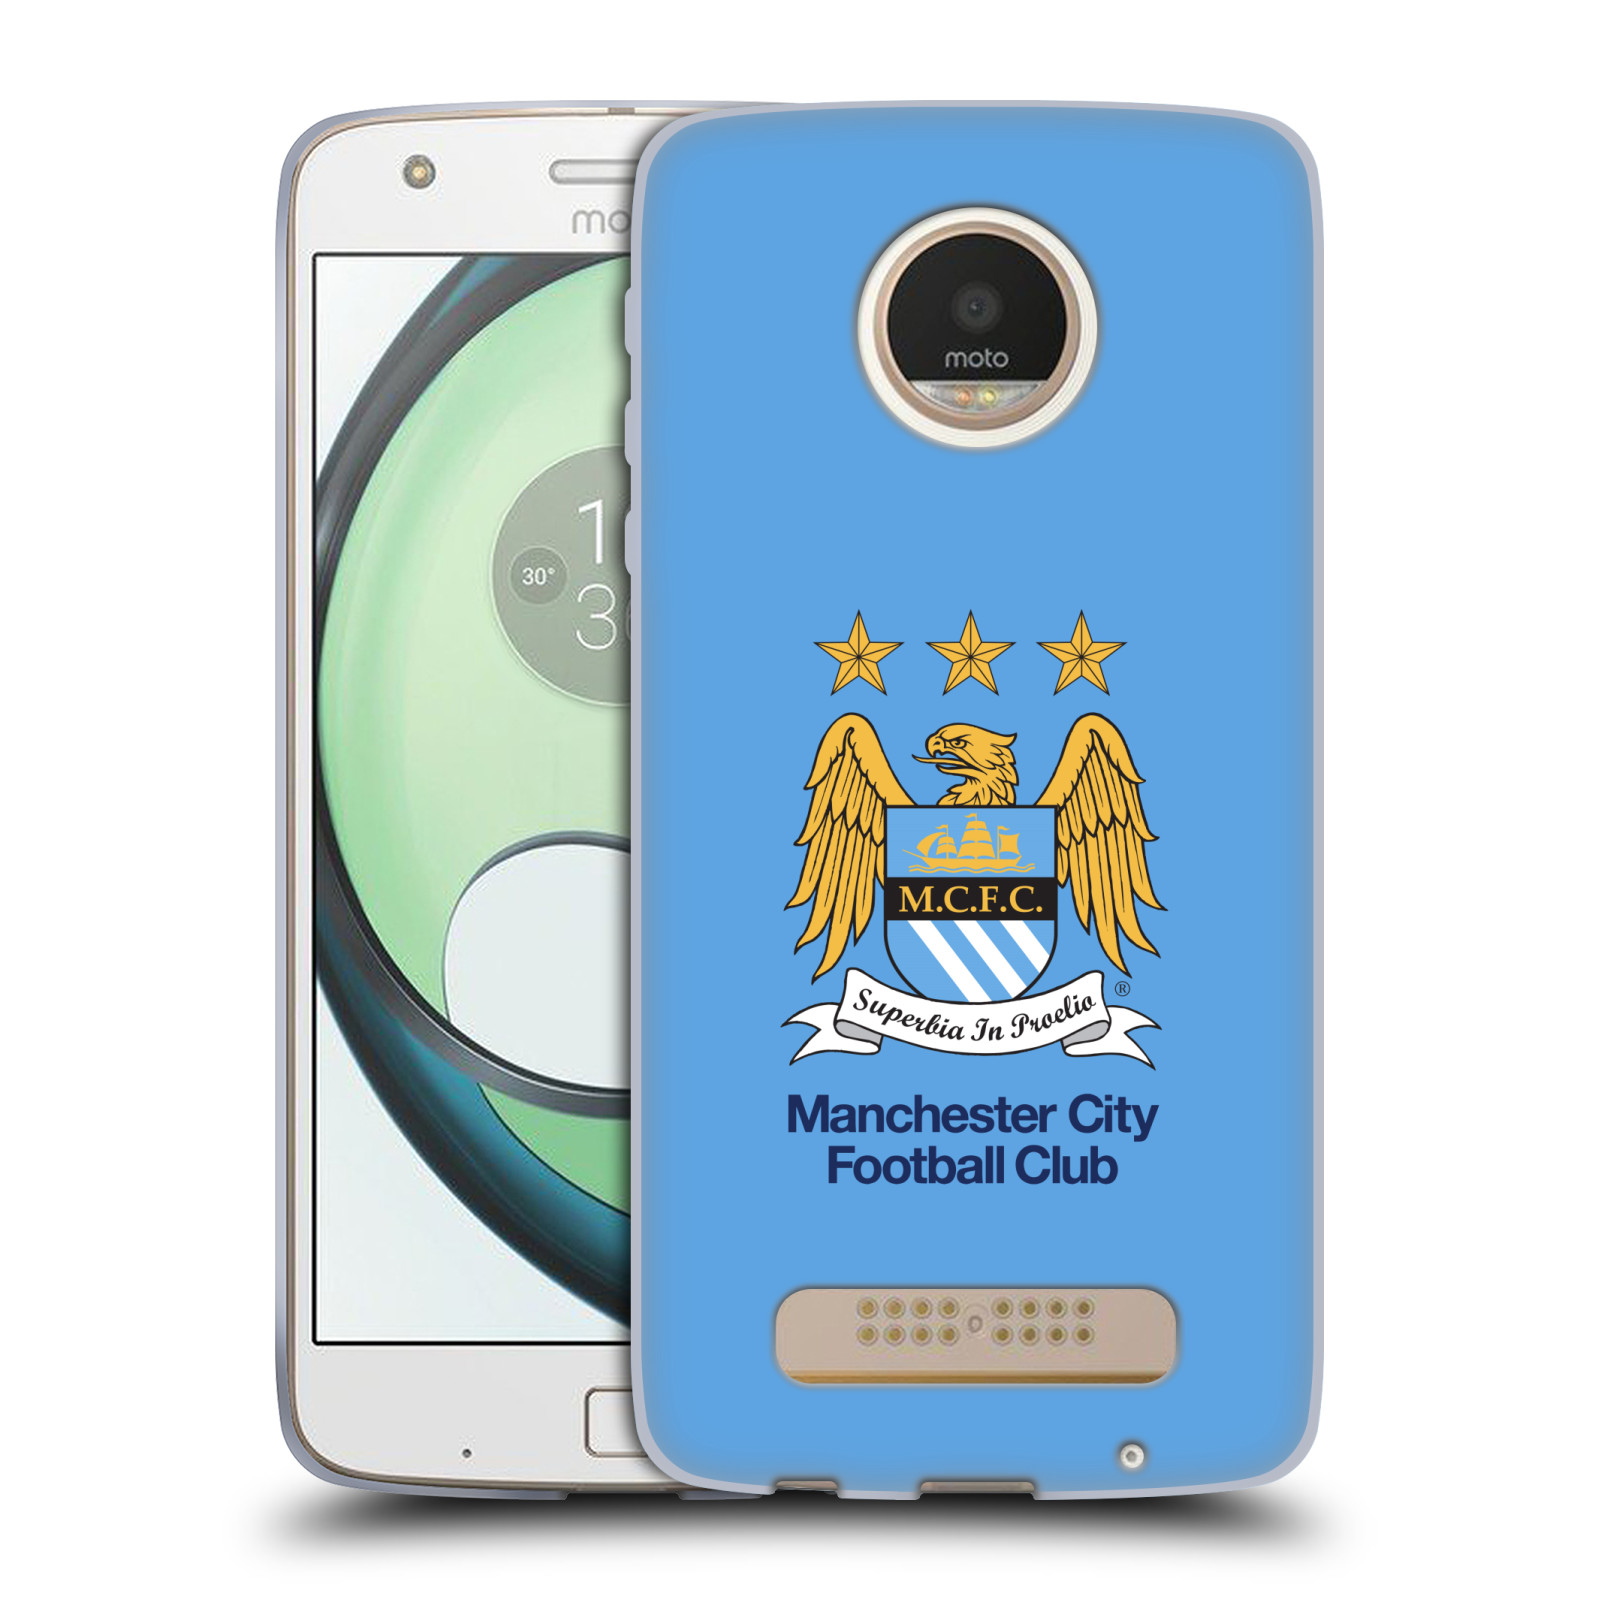 HEAD CASE silikonový obal na mobil Lenovo Moto Z PLAY Fotbalový klub Manchester City nebesky modrá pozadí velký znak pták